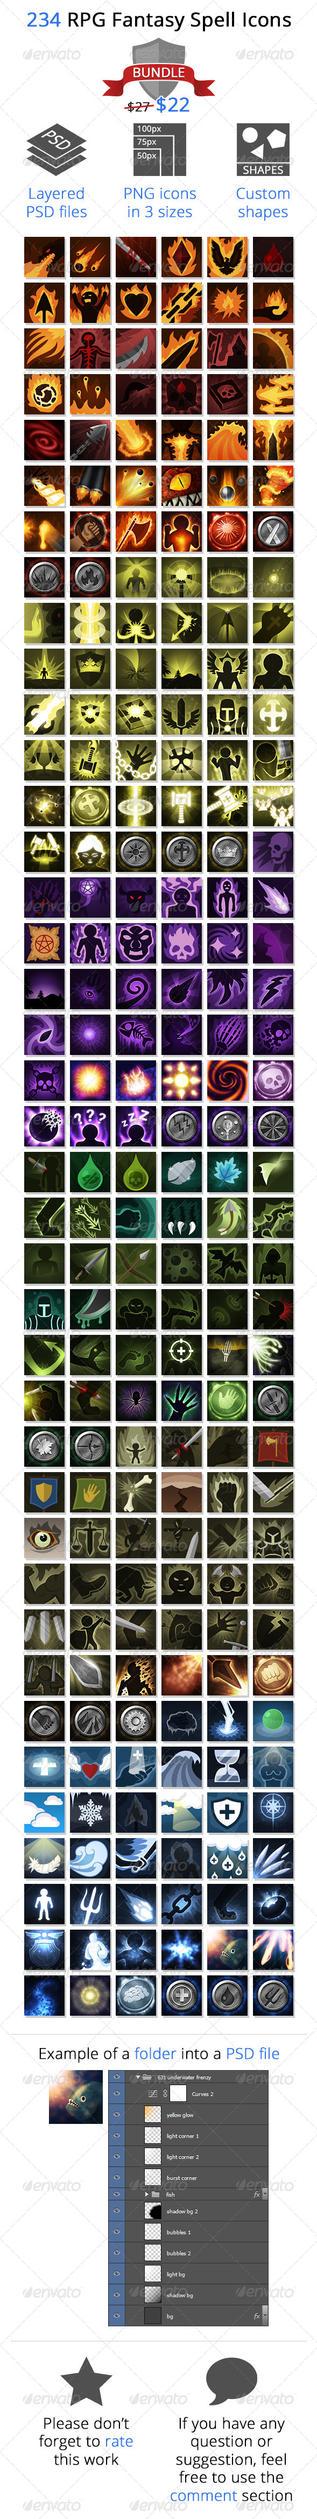 RPG Fantasy Spells Icons Bundle by ruizb